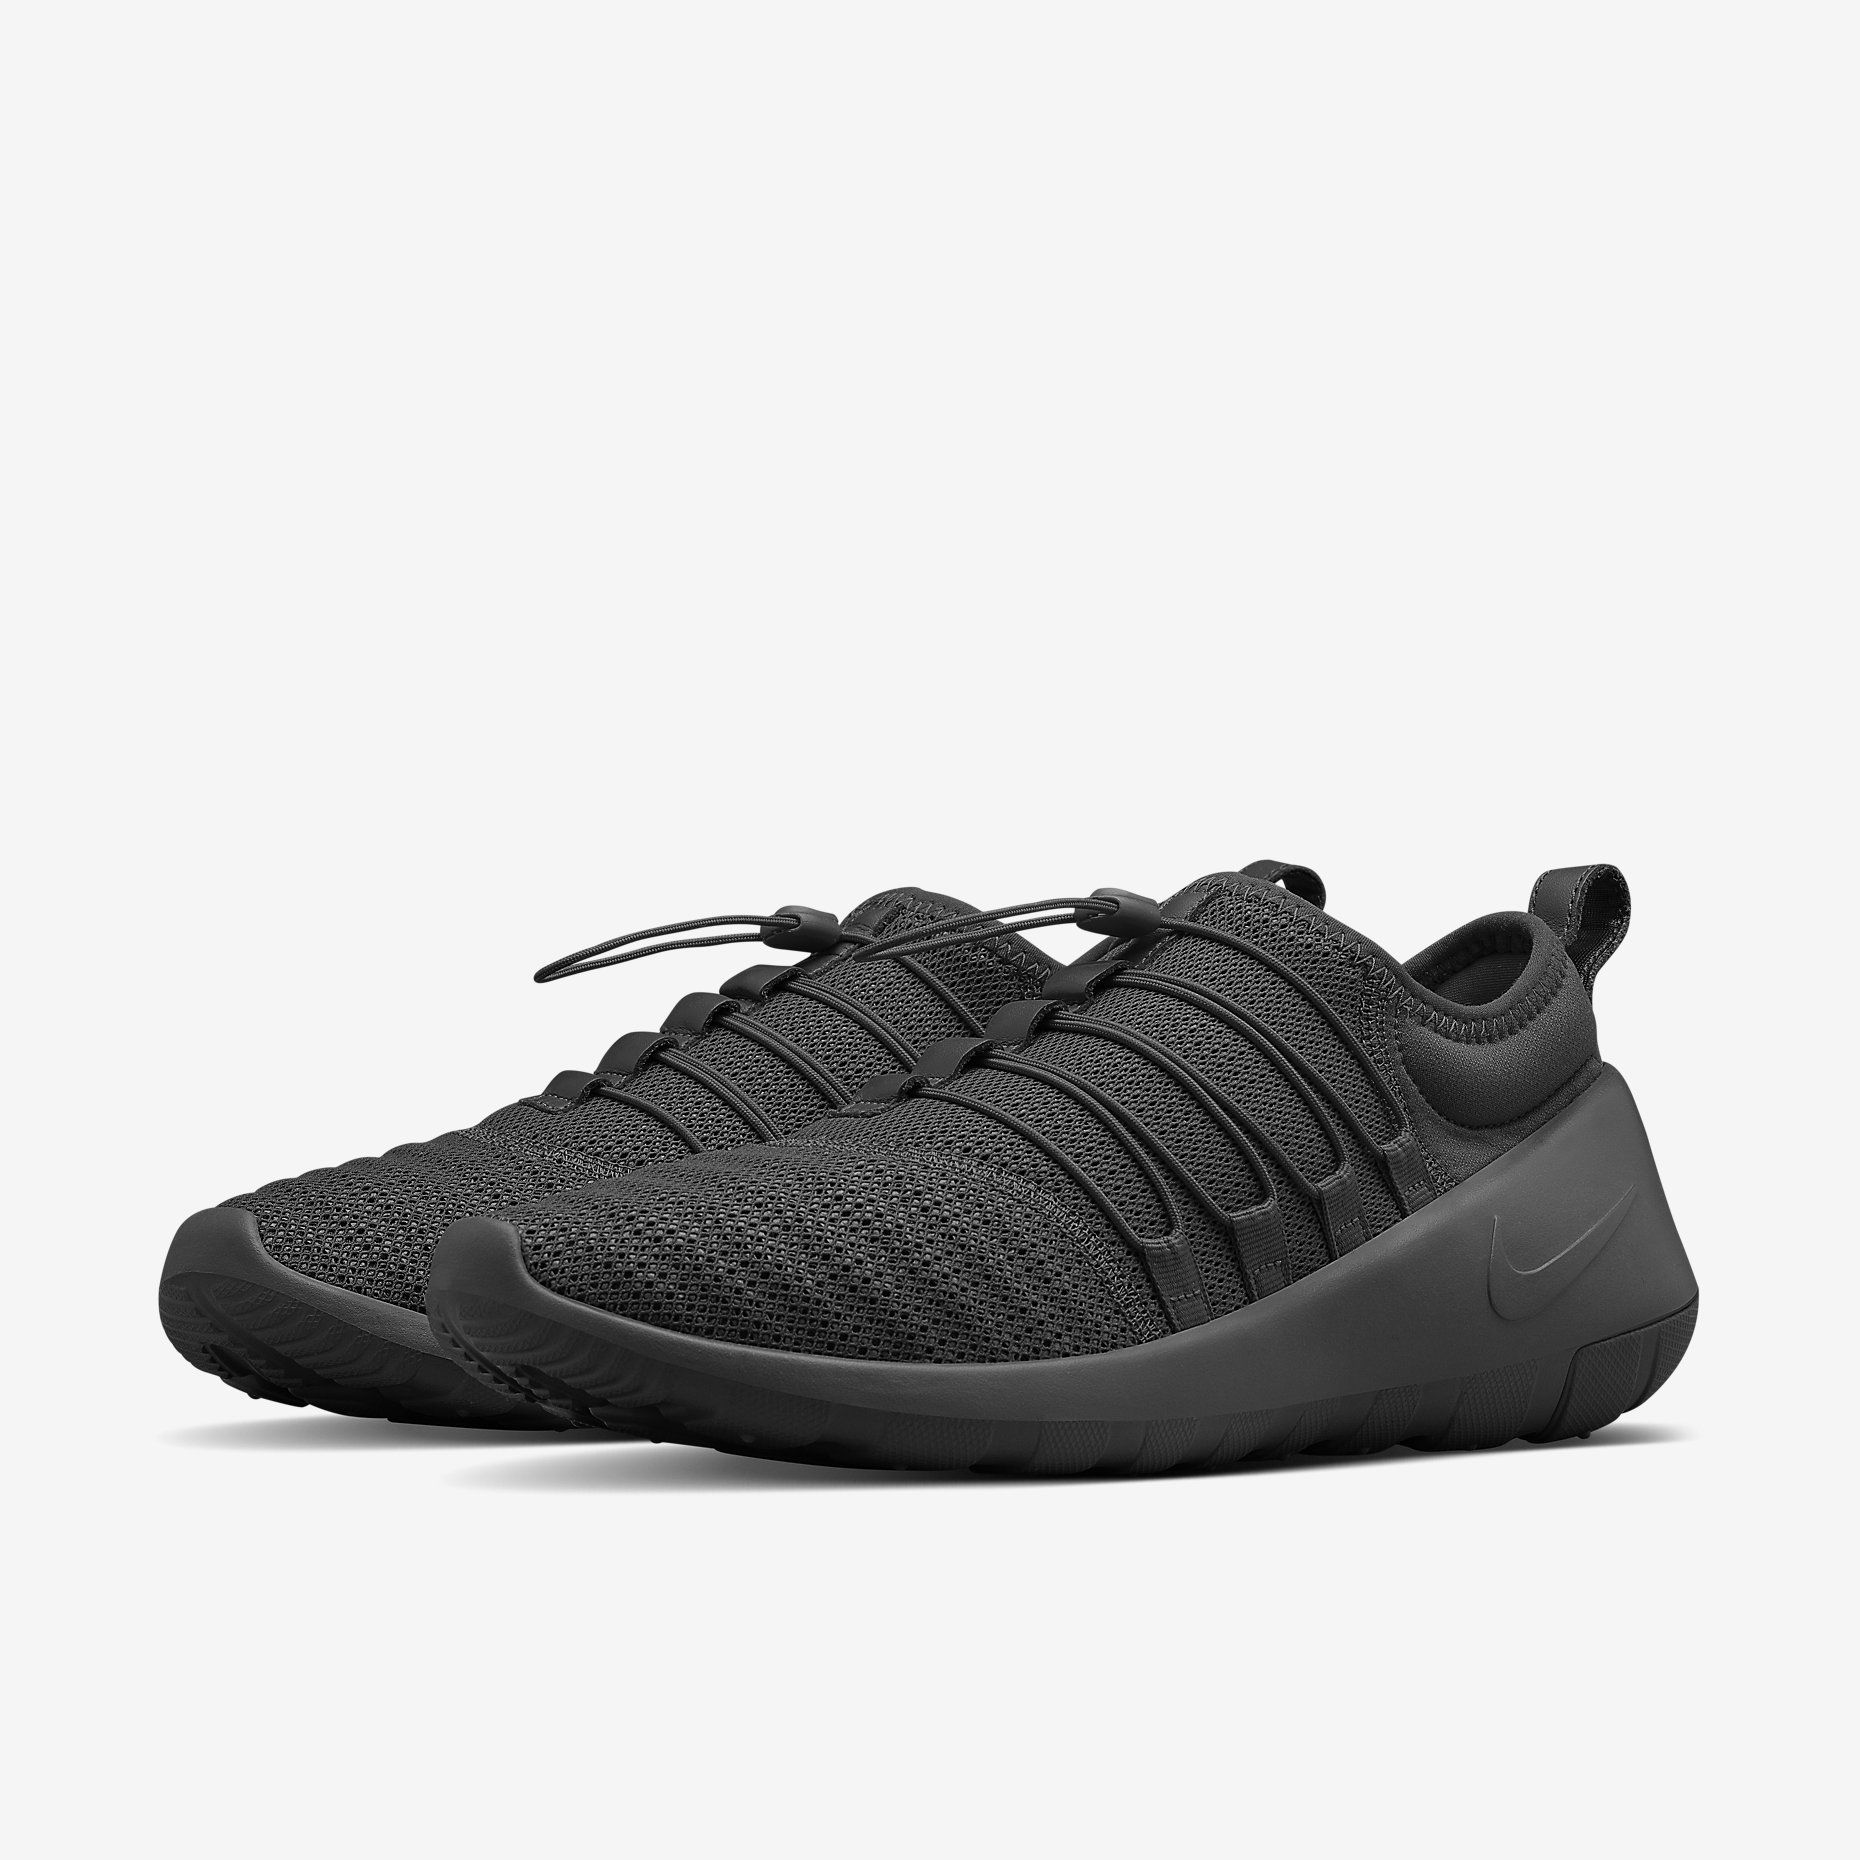 reputable site 0e43b d34de NikeLab Payaa – Chaussure pour Homme. Nike.com (FR)